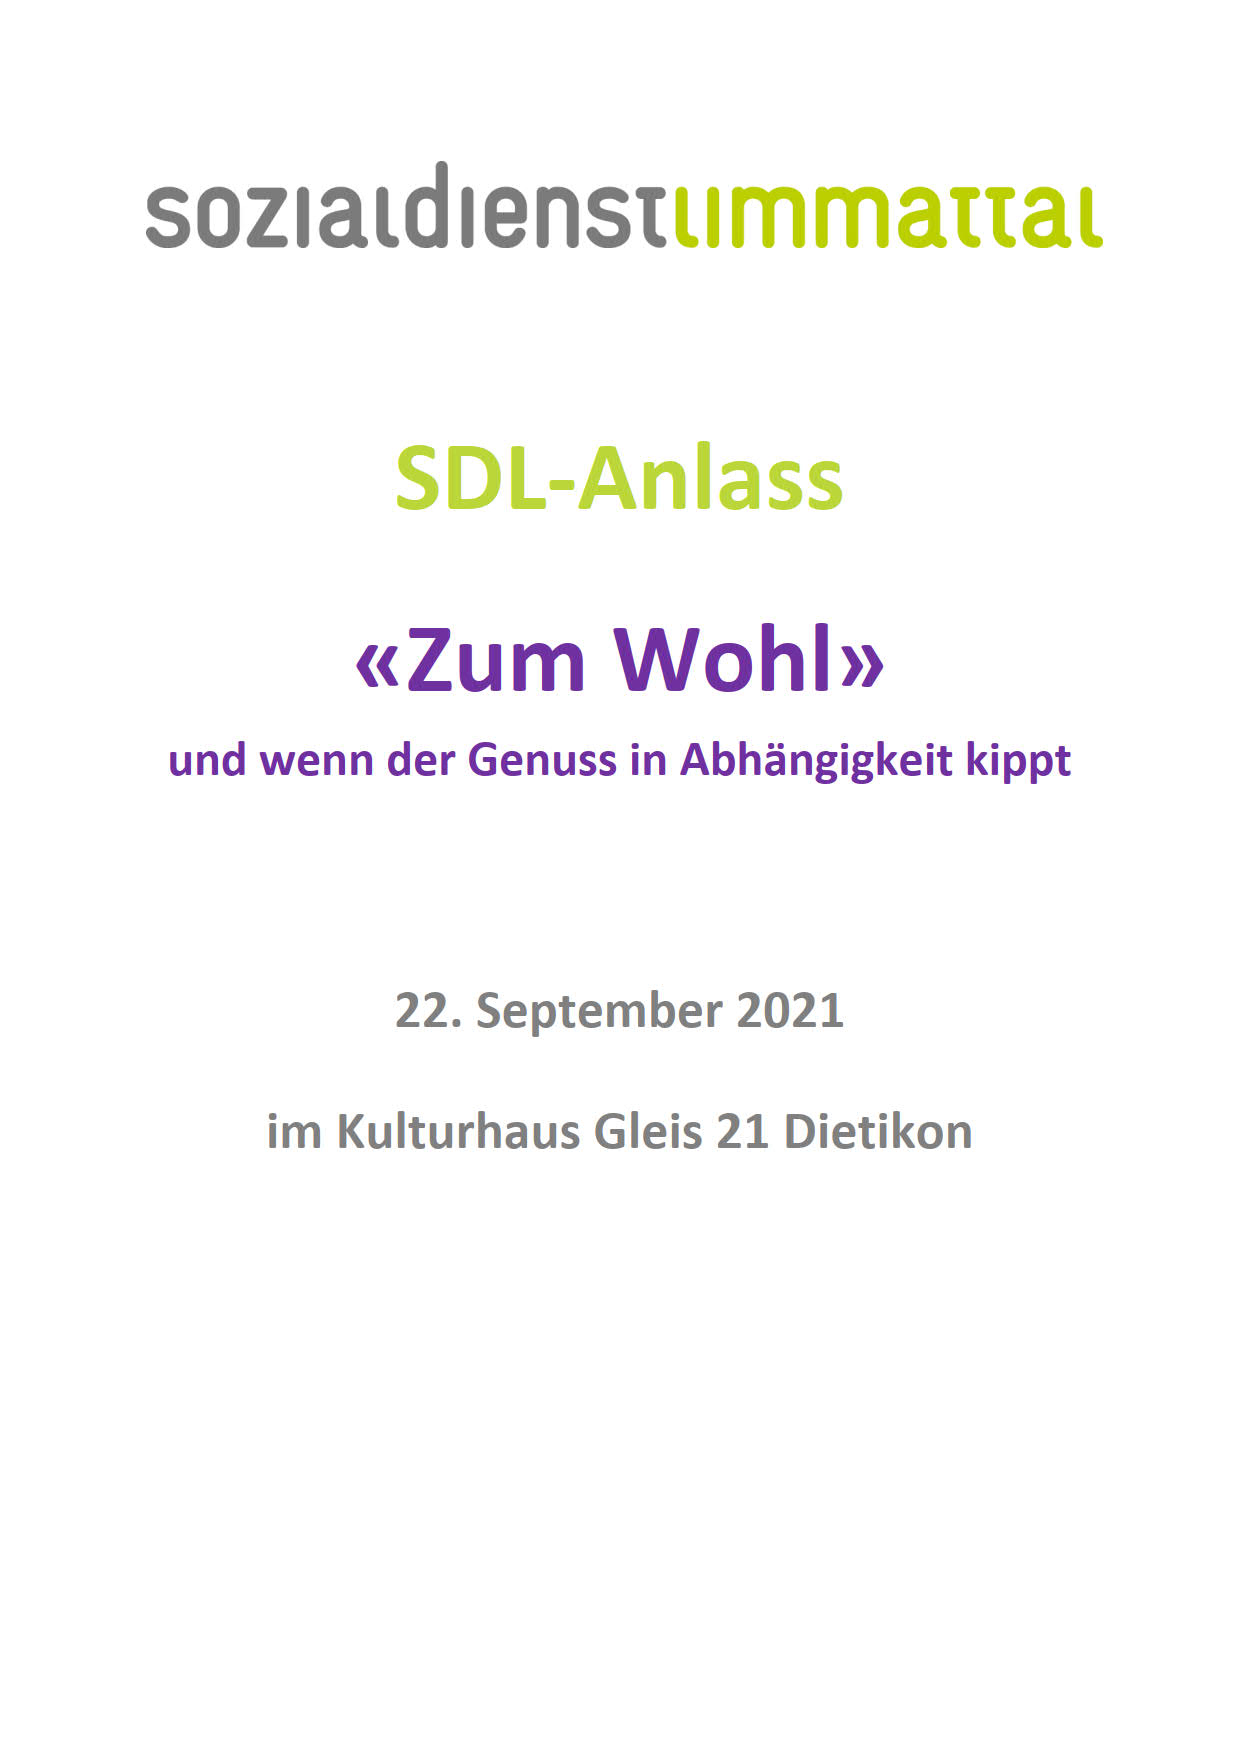 SDL-Anlass